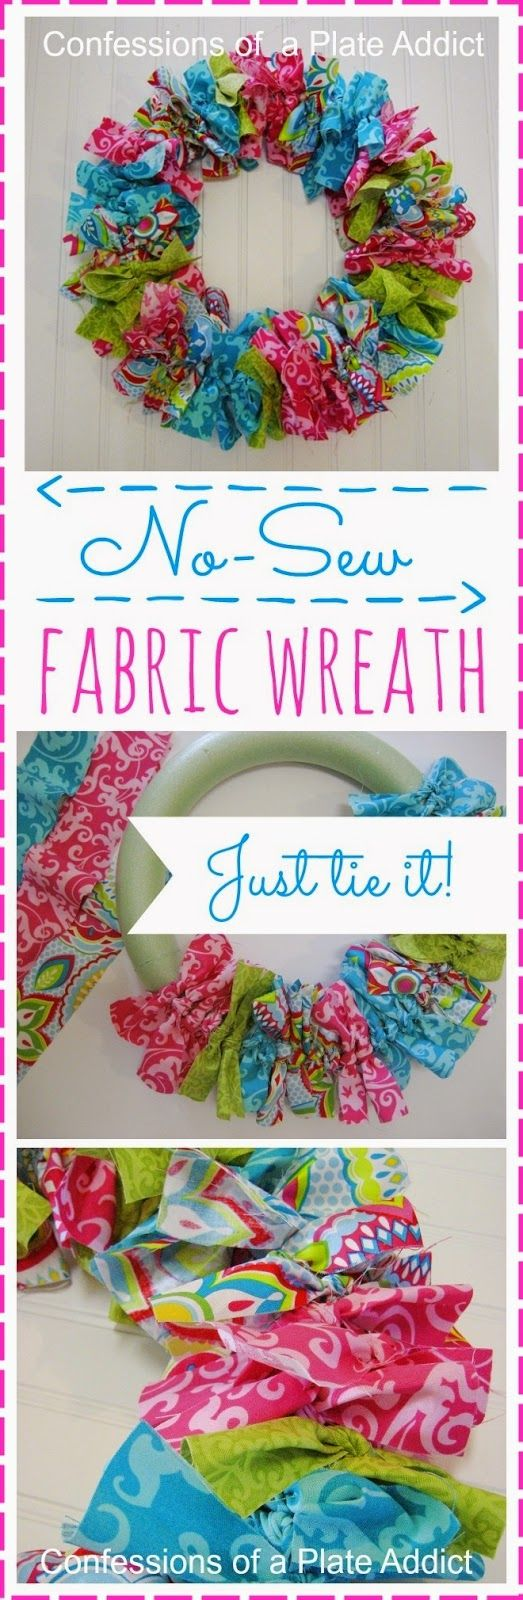 Easy No-Sew Fabric Wreath.